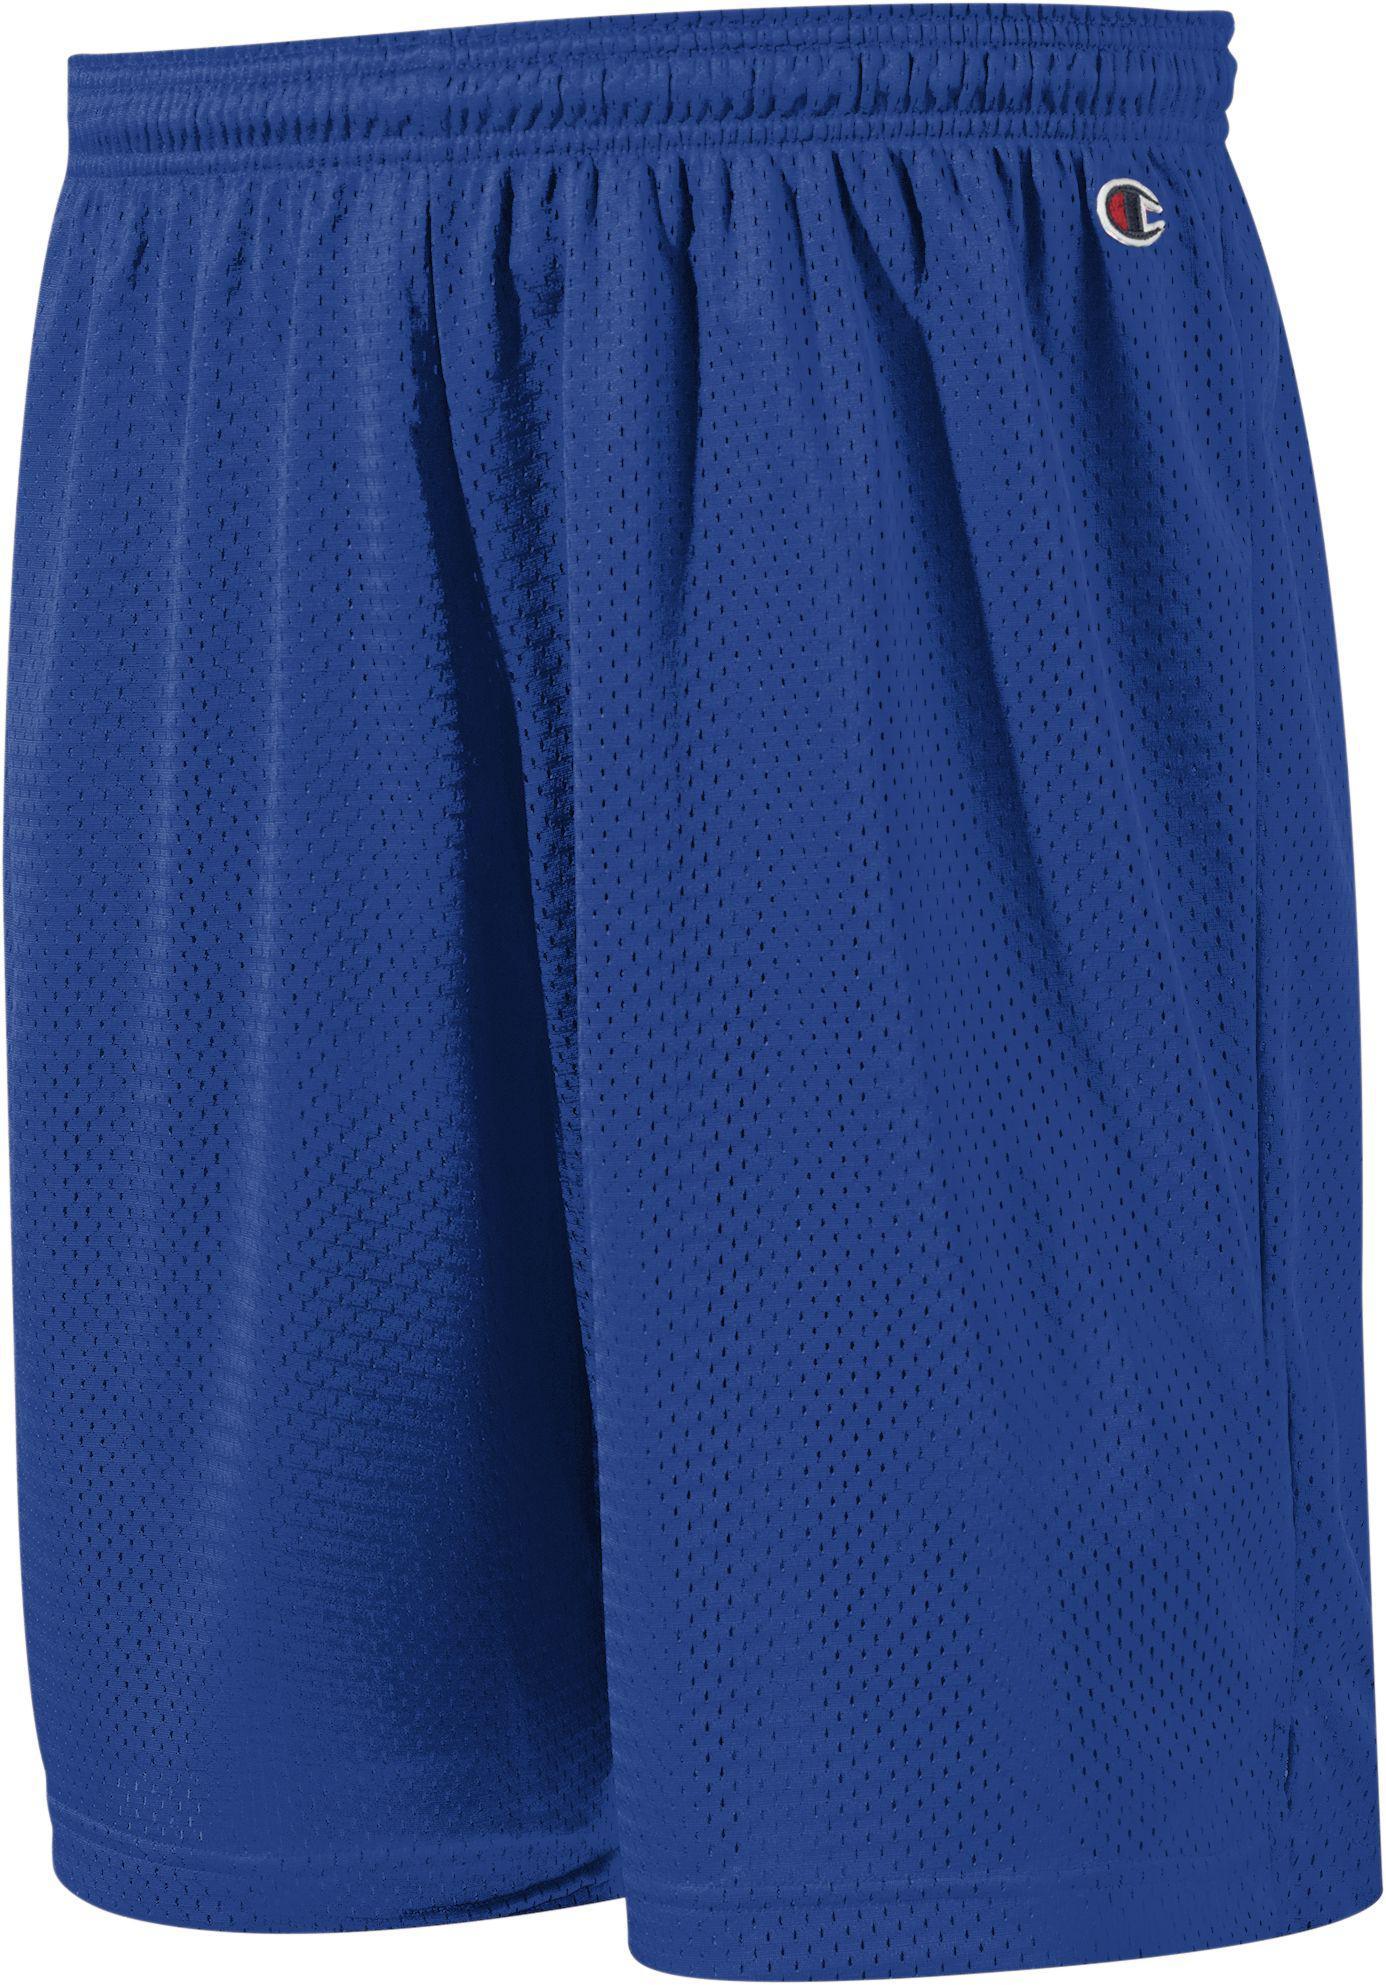 a2b9f0f49e Champion Pocketless Mesh 9'' Shorts in Blue for Men - Lyst